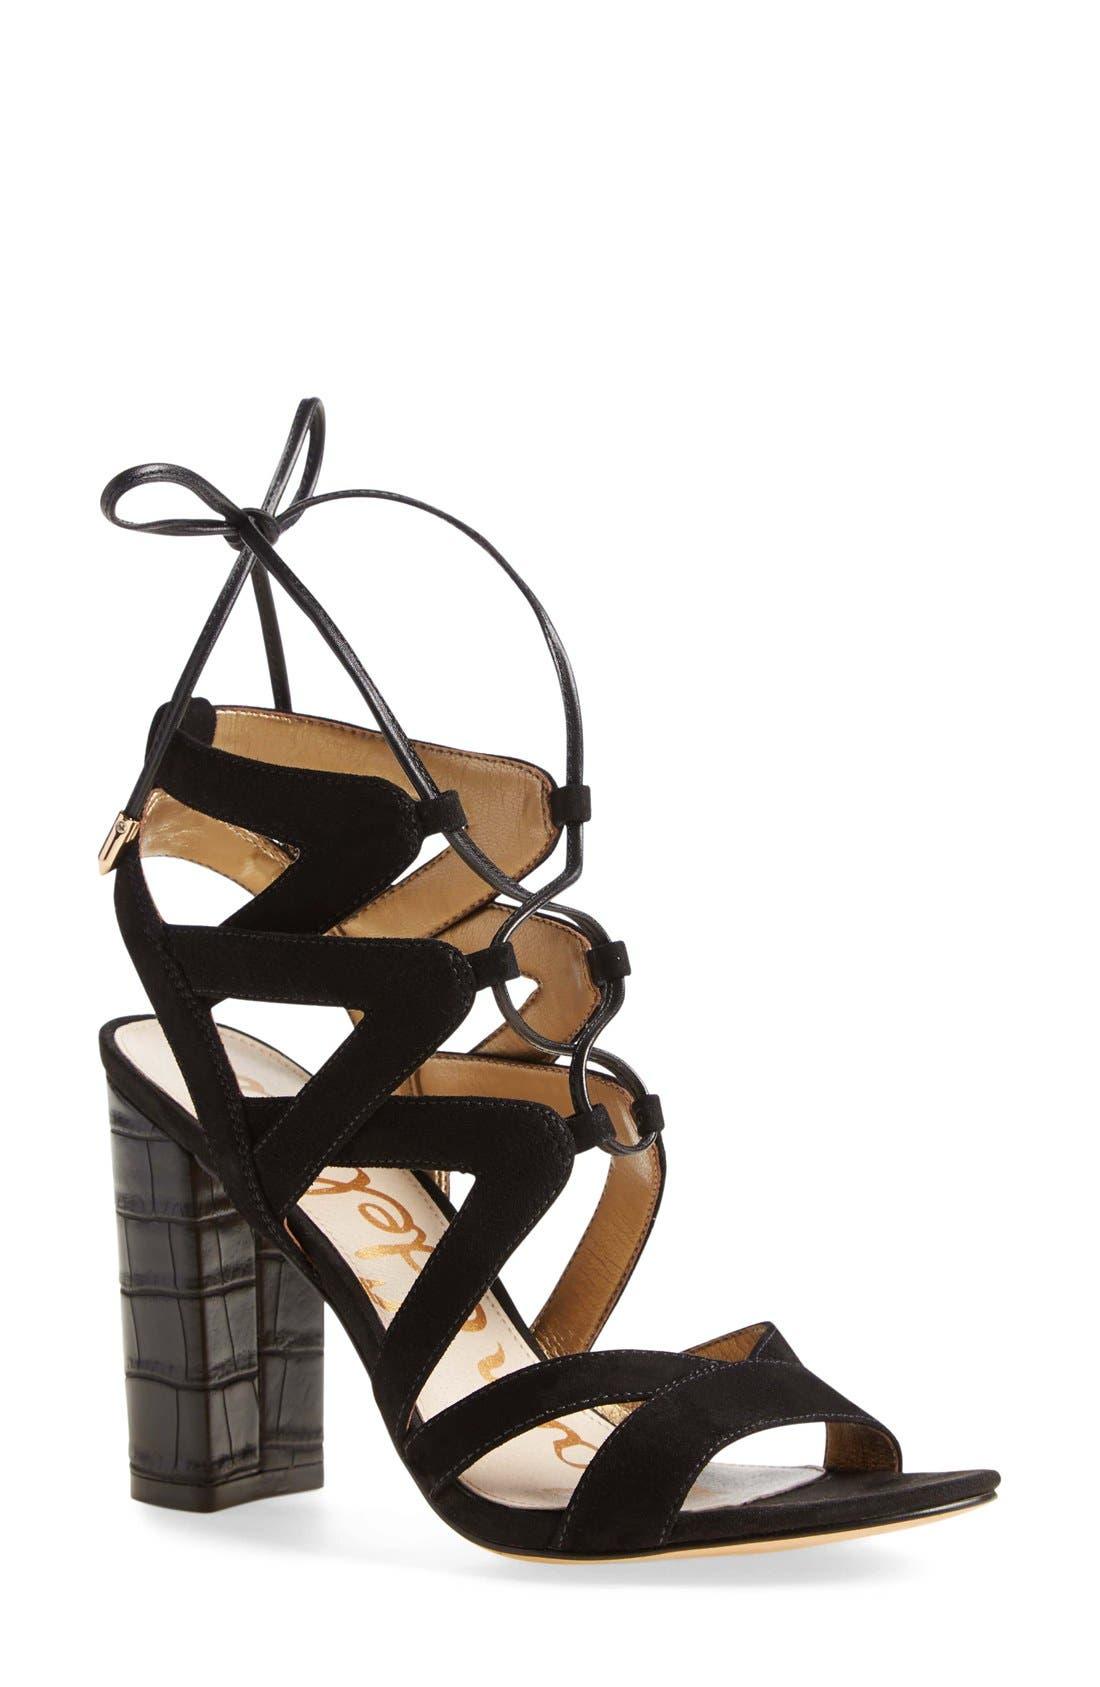 SAM EDELMAN 'Yardley' Lace-Up Sandal, Main, color, 001